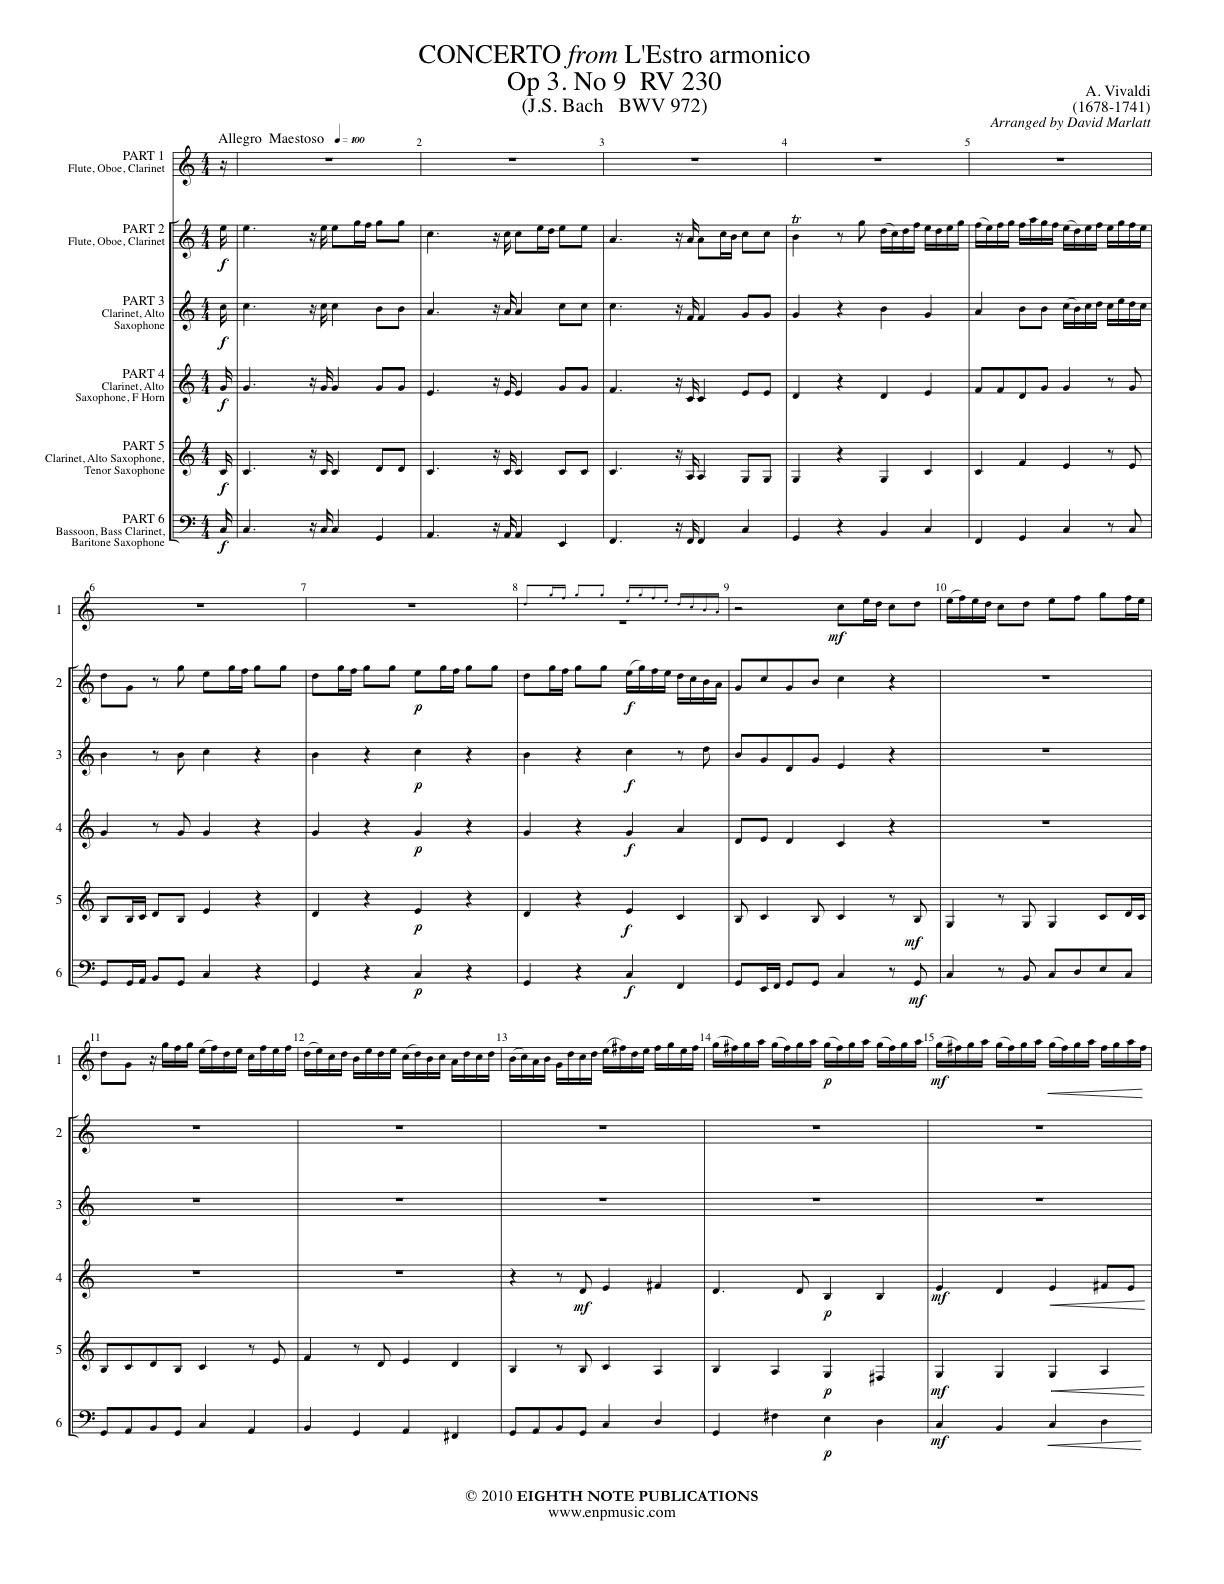 Concerto from L�estro armonico Op. 3 #9 - Antonio Vivaldi